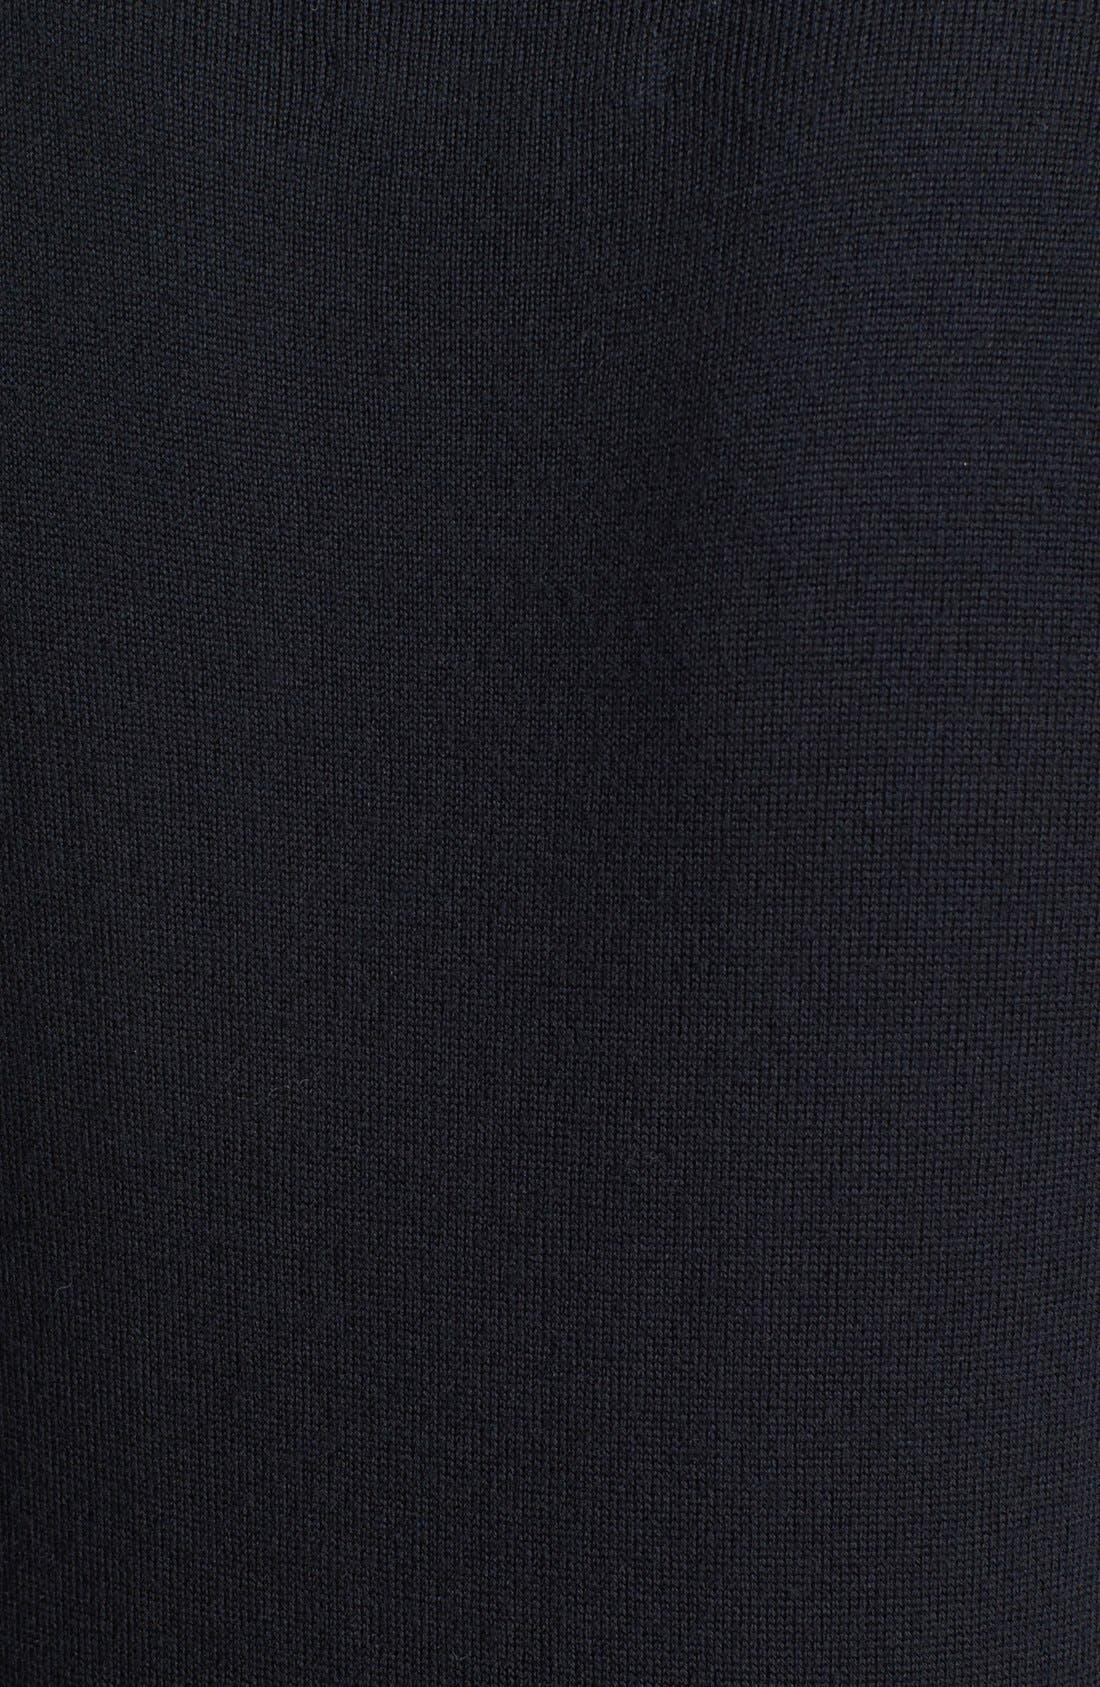 'Karsyn Kiss & Tell' Sweater,                             Alternate thumbnail 2, color,                             009